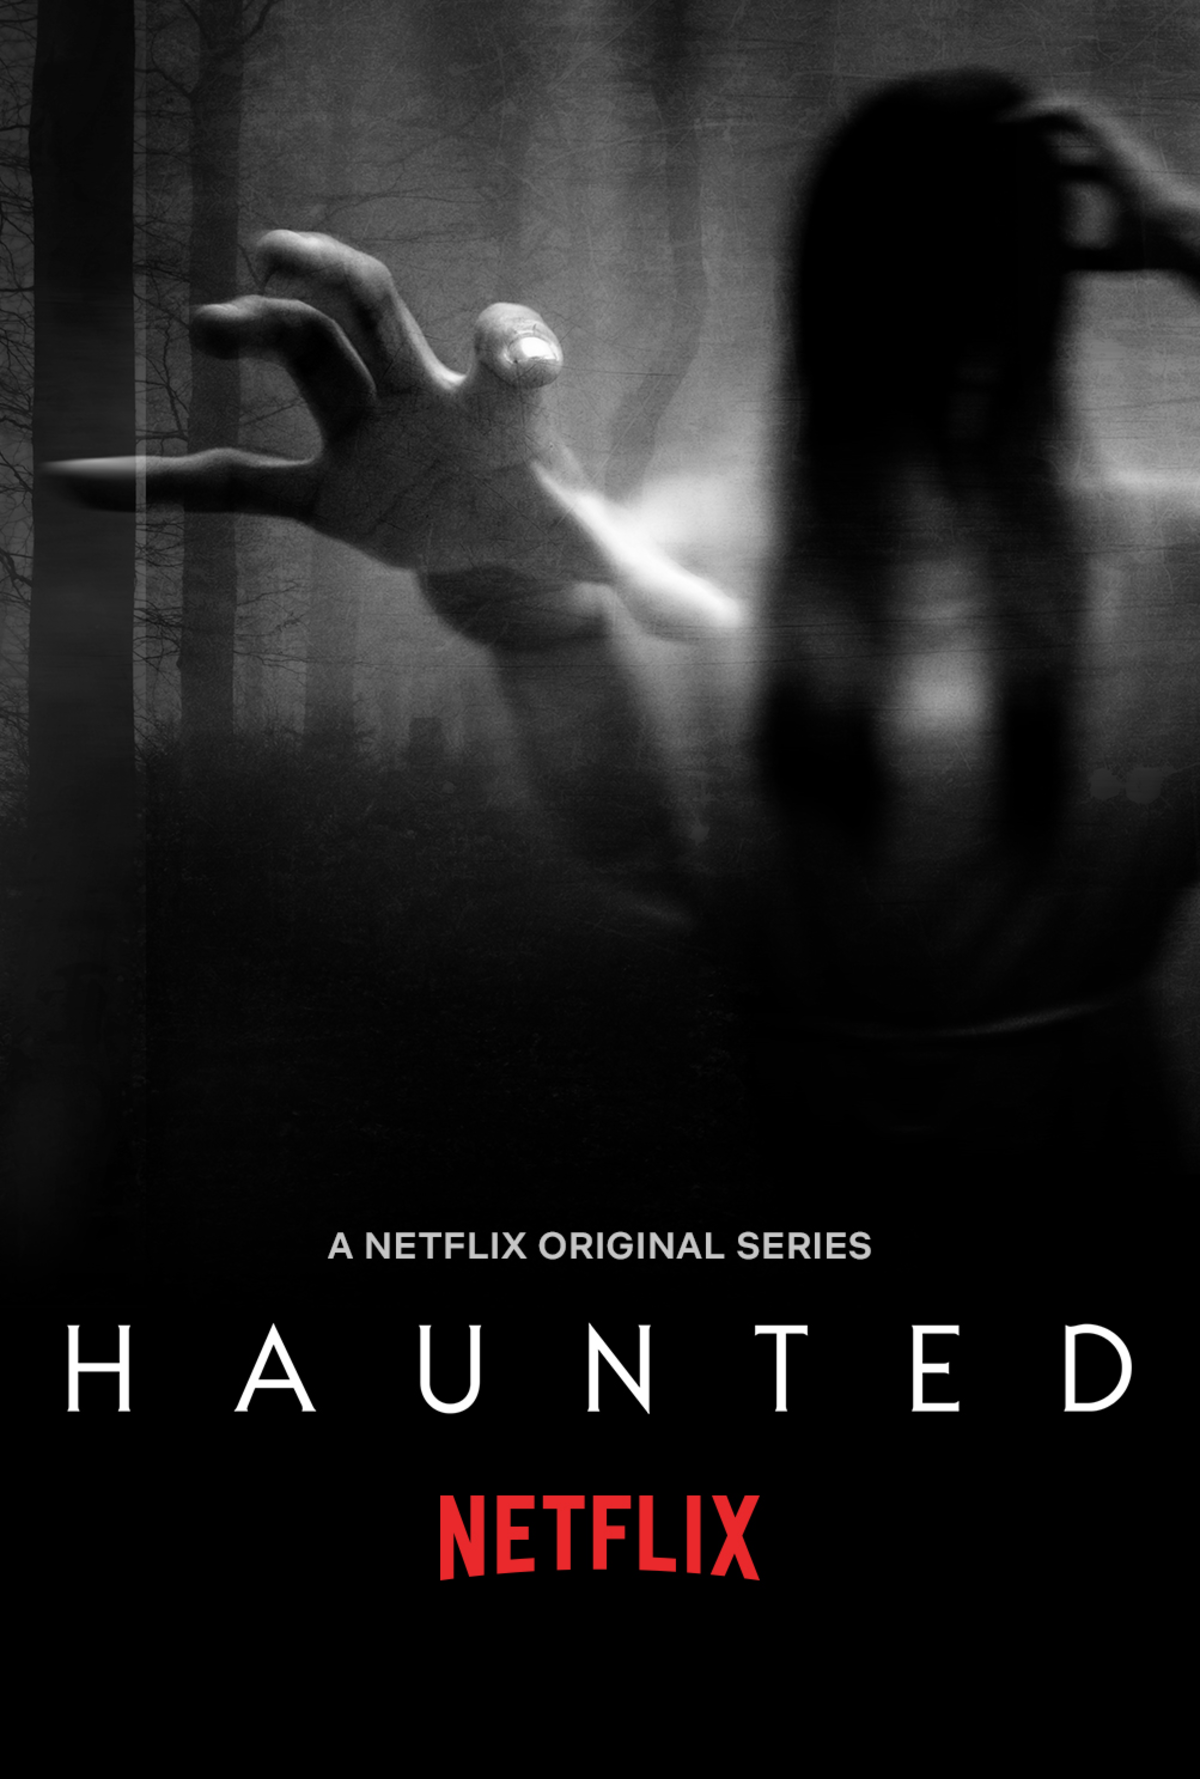 Netflix's new series Haunted tells your true horror stories